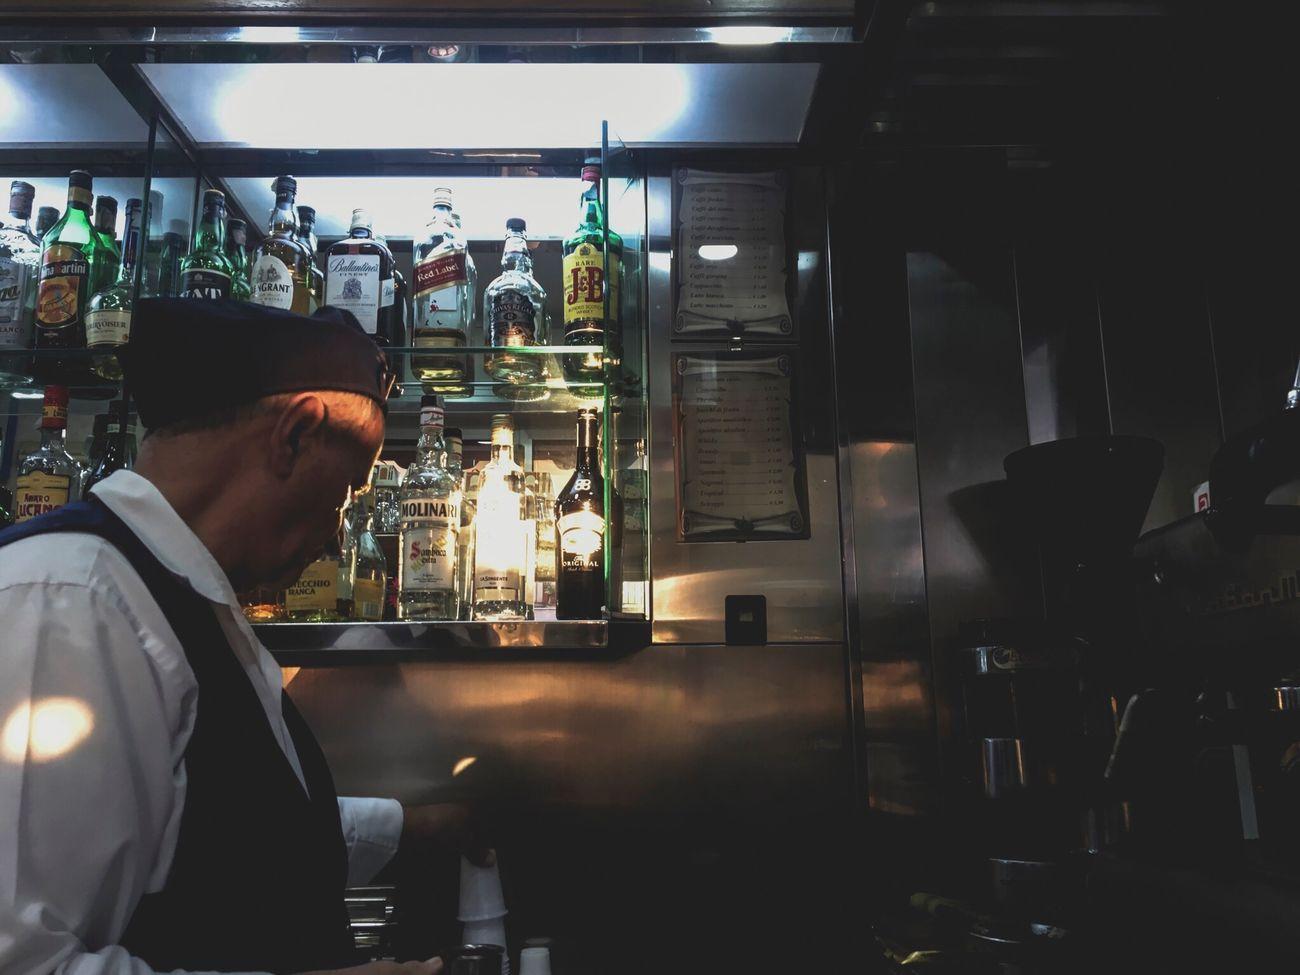 Coffee Coffee Time Cafe Napoli Naples Italia Italy Raffaelle Bar Toto Delacruzfotografia David De La Cruz